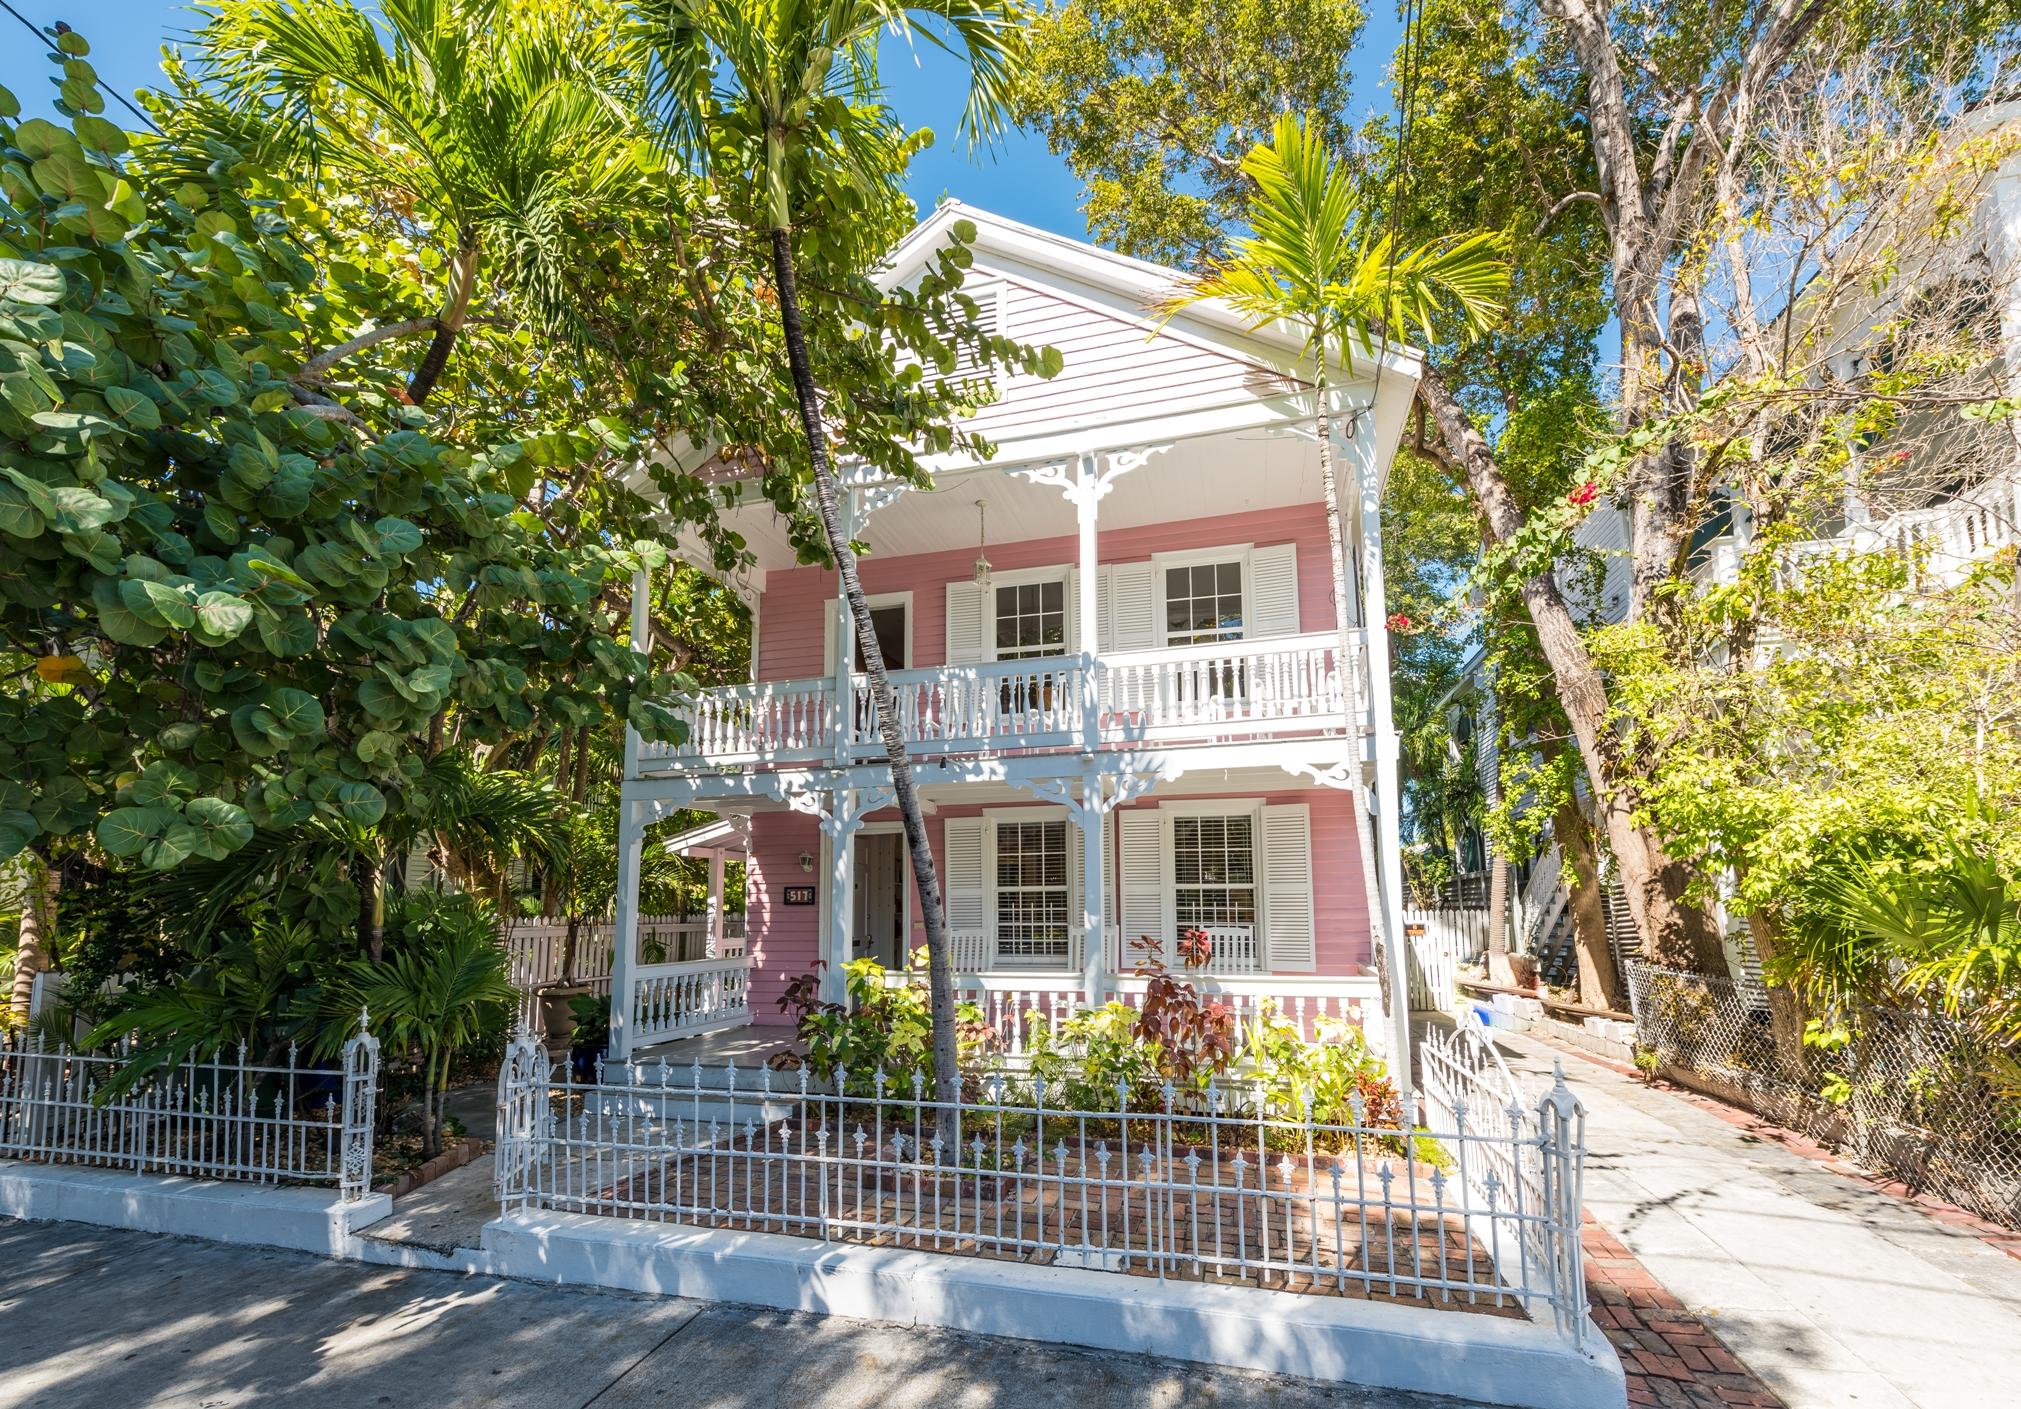 Key West Vacation Home Rental - William Skelton House